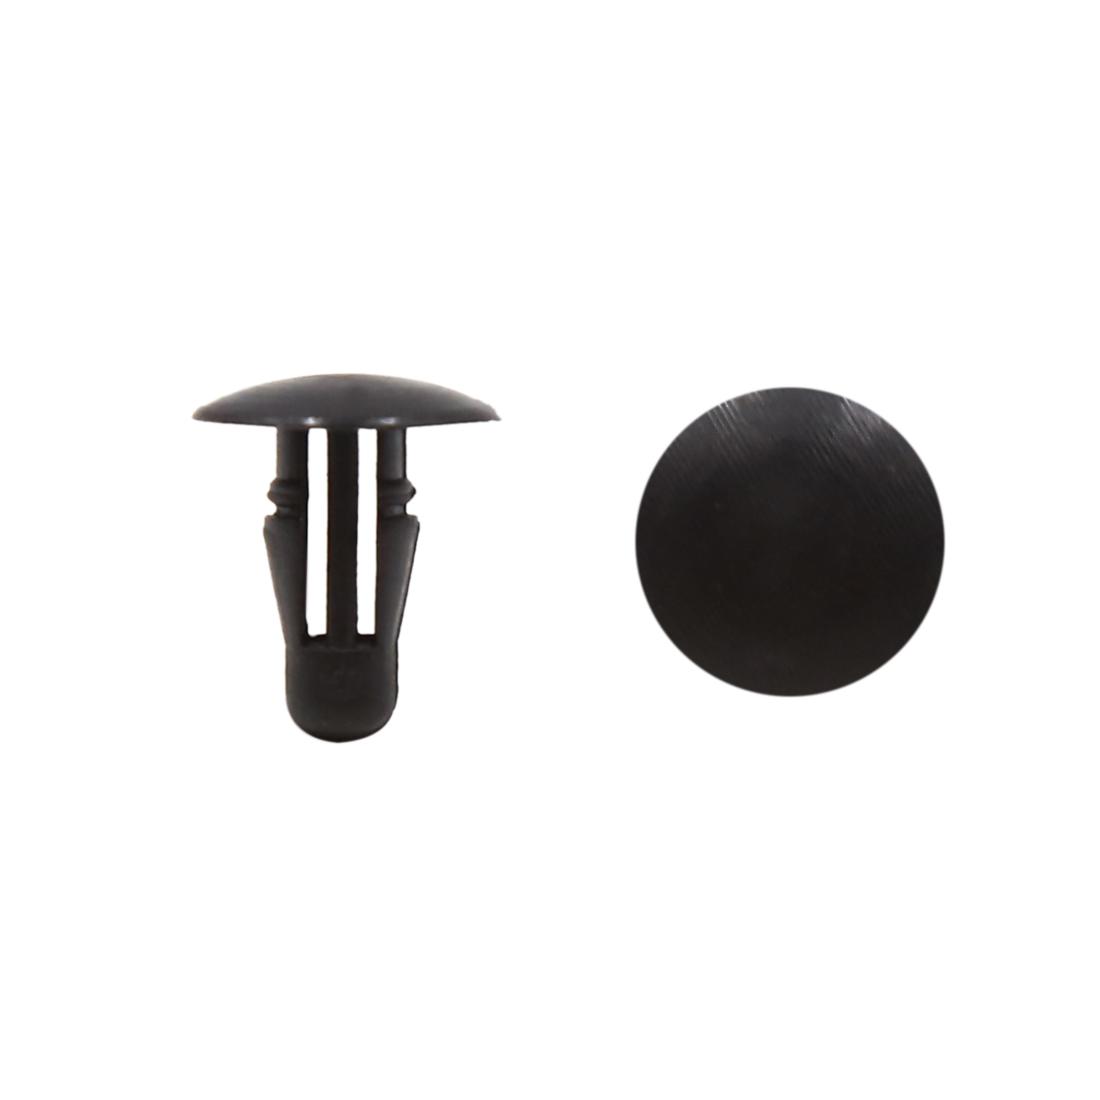 100Pcs 6mm Hole Plastic Rivets Bumper Fender Fastener Retainers Clips Black